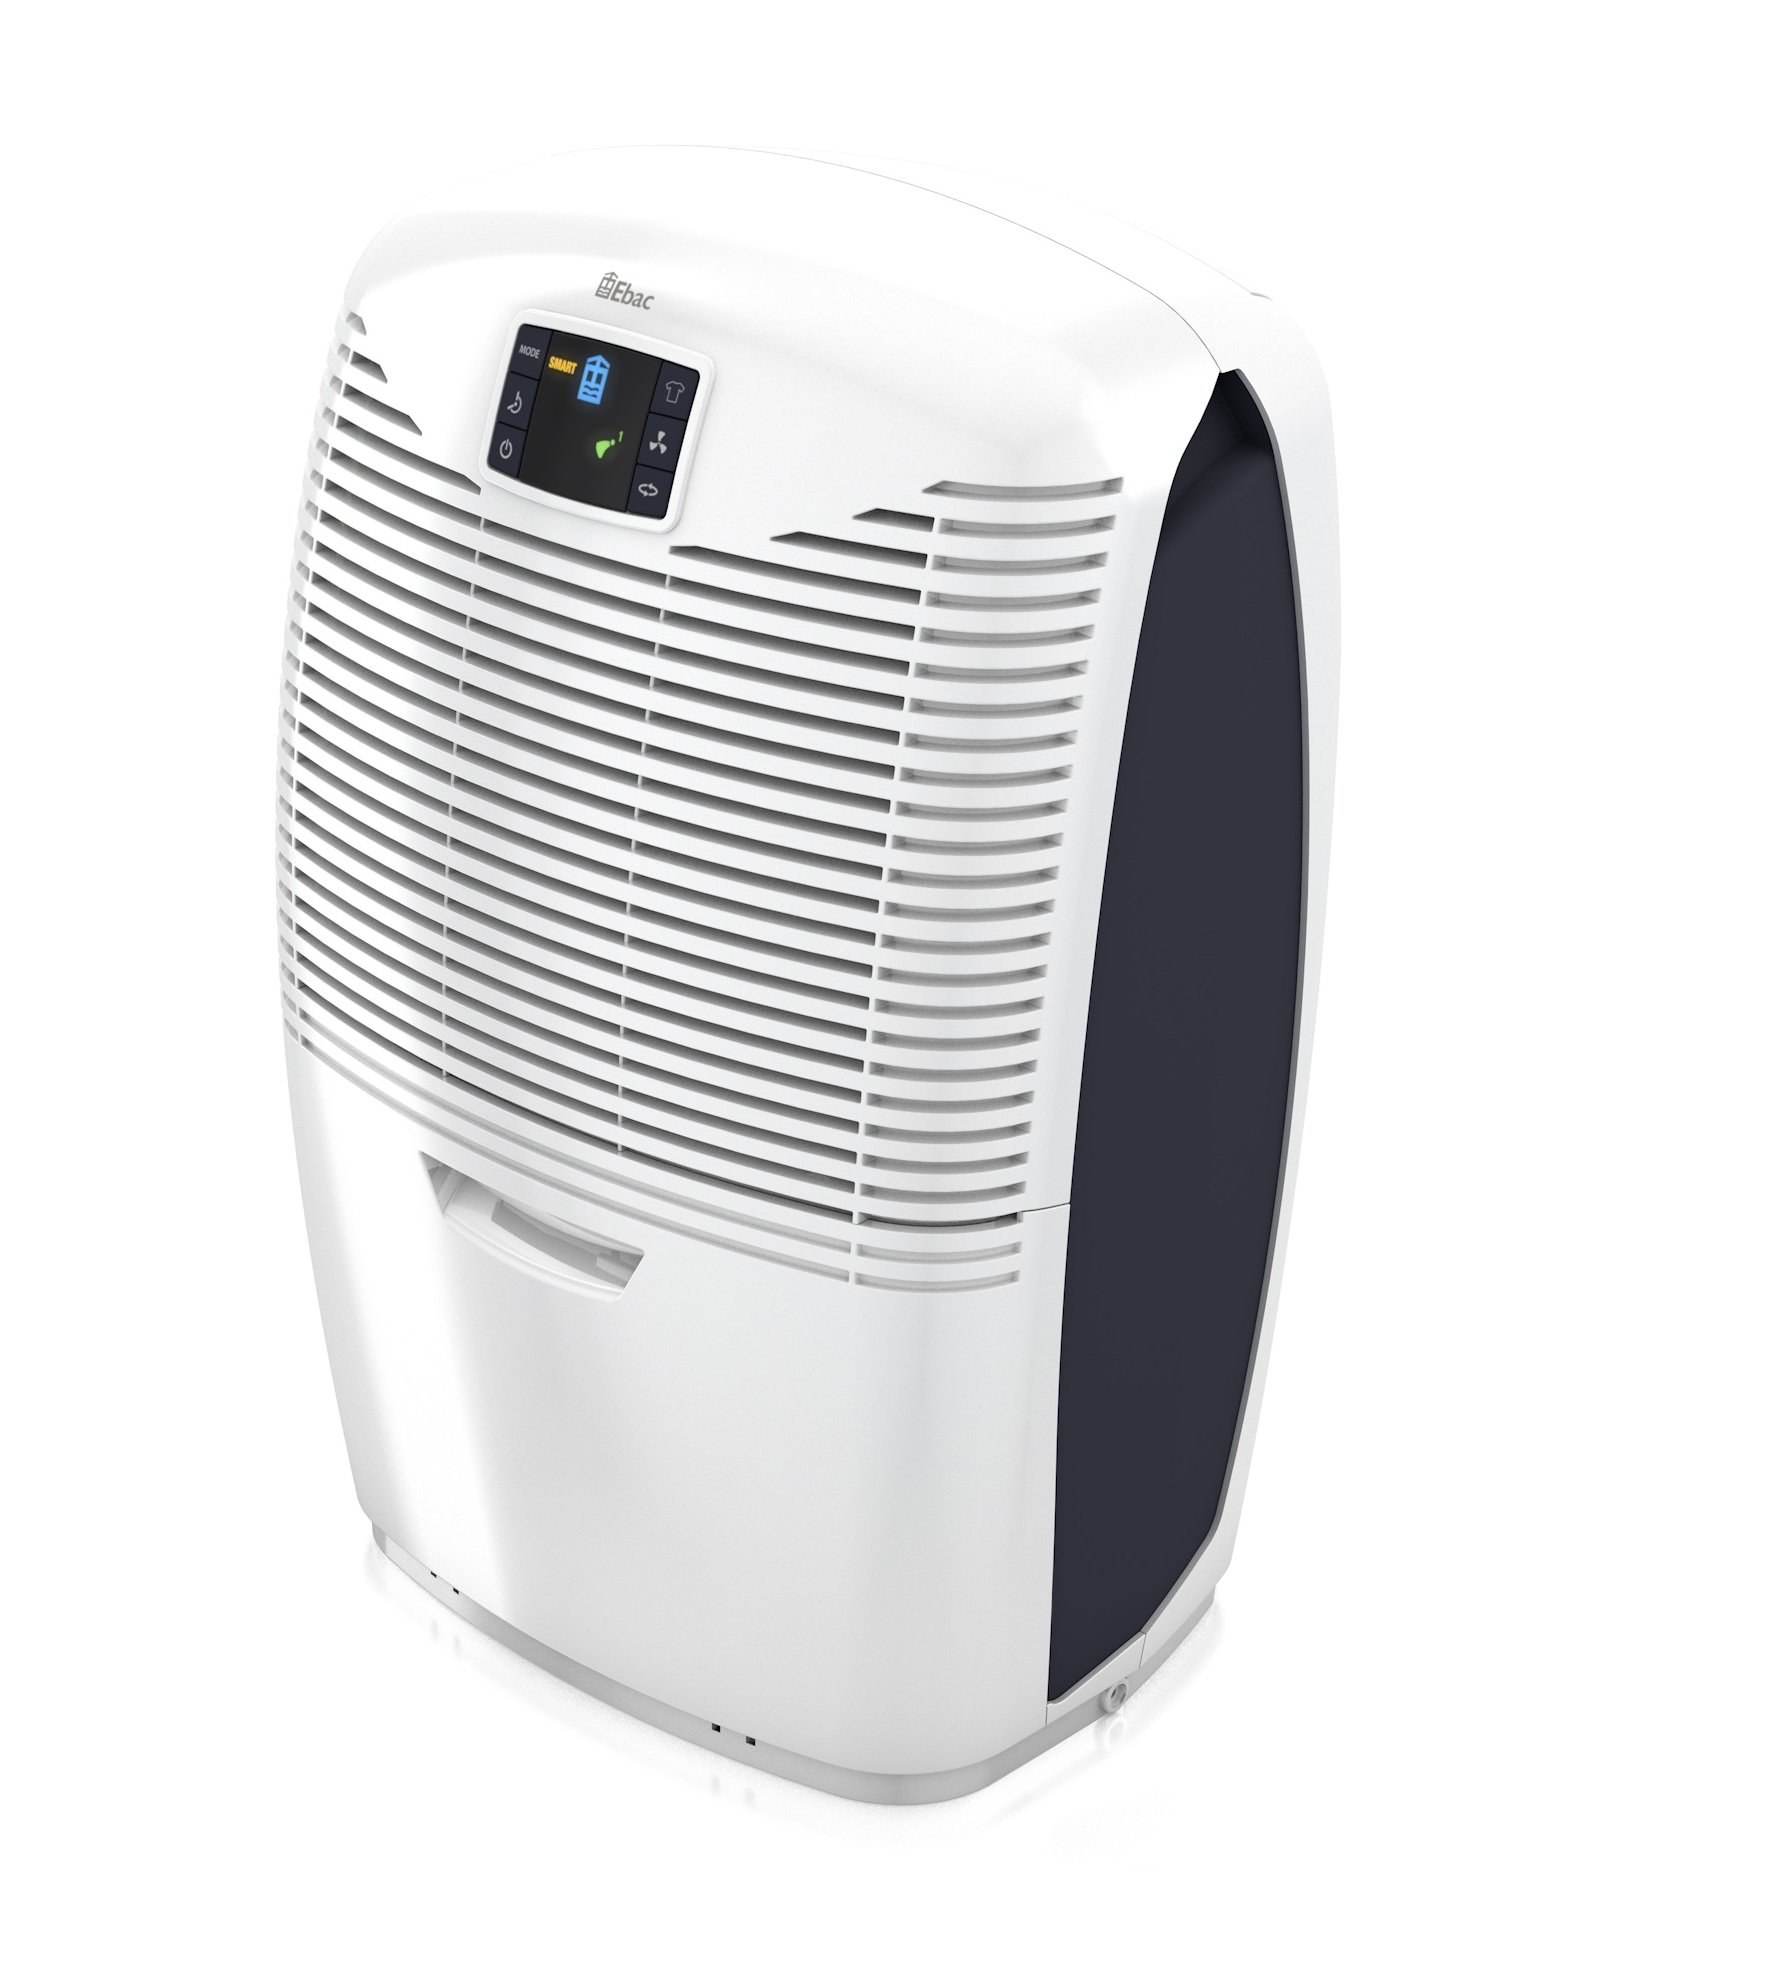 ebac 3650e high performance dehumidifier low energy 18. Black Bedroom Furniture Sets. Home Design Ideas